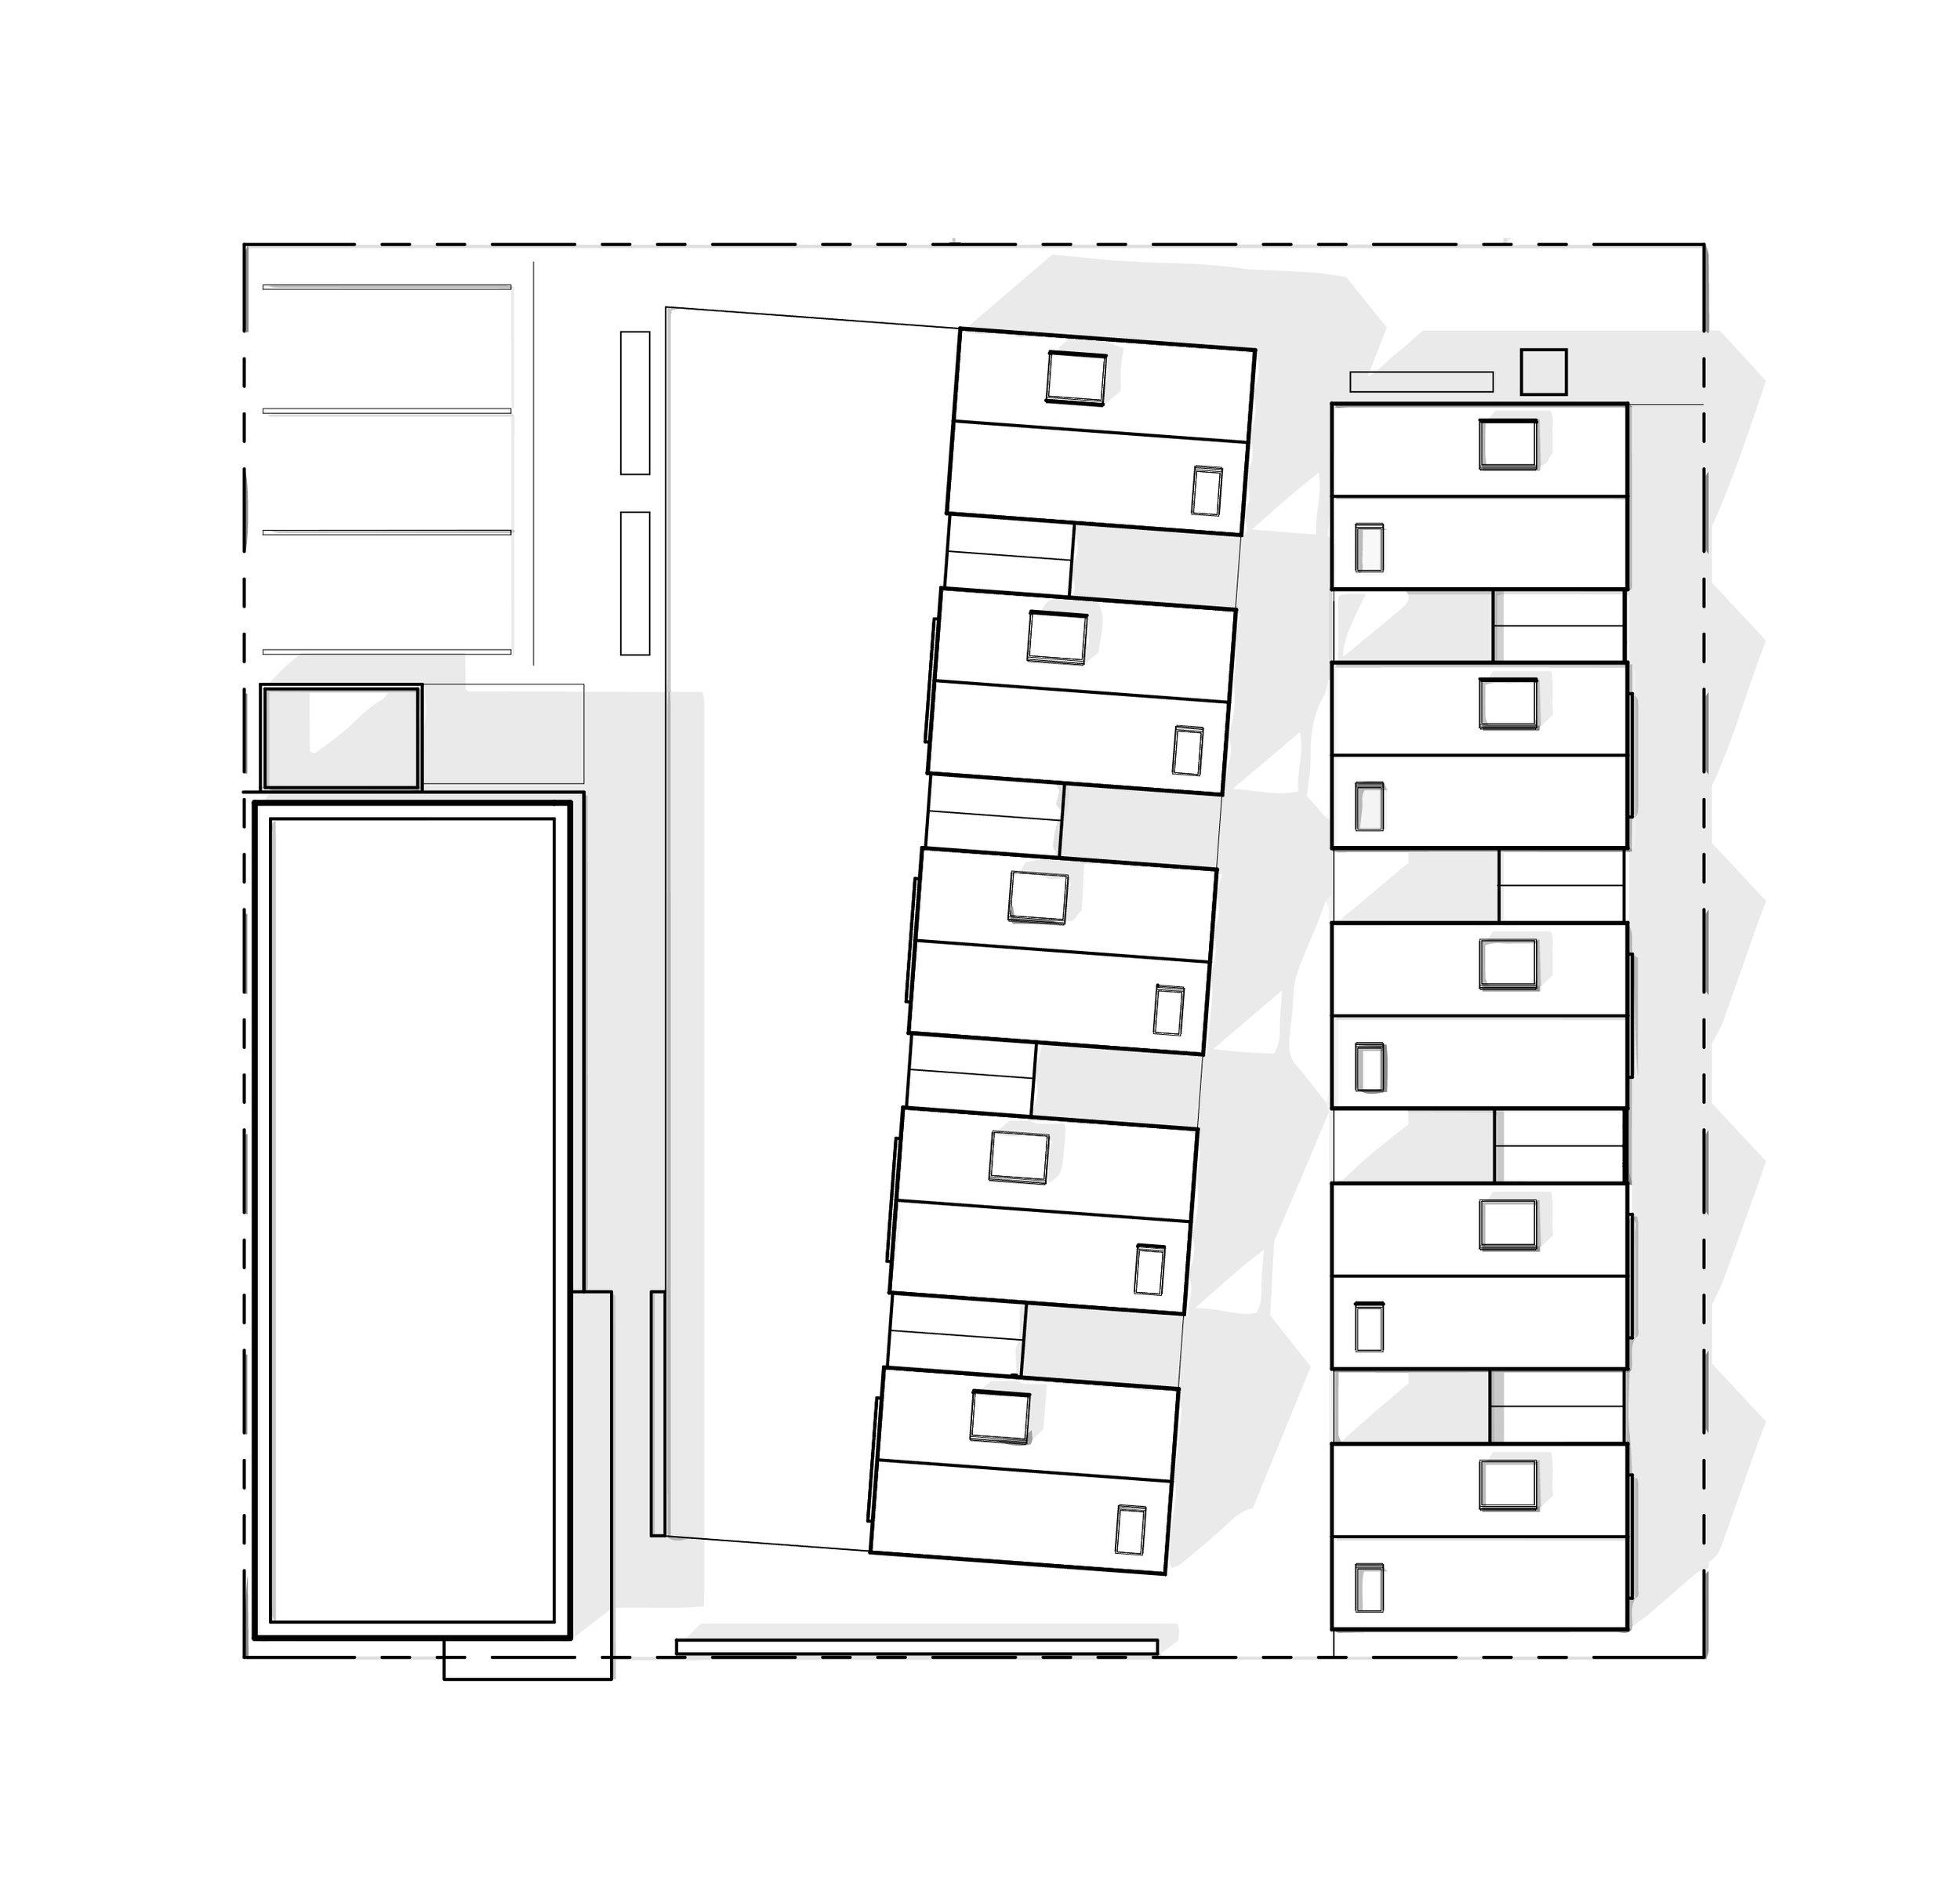 site-01.jpg